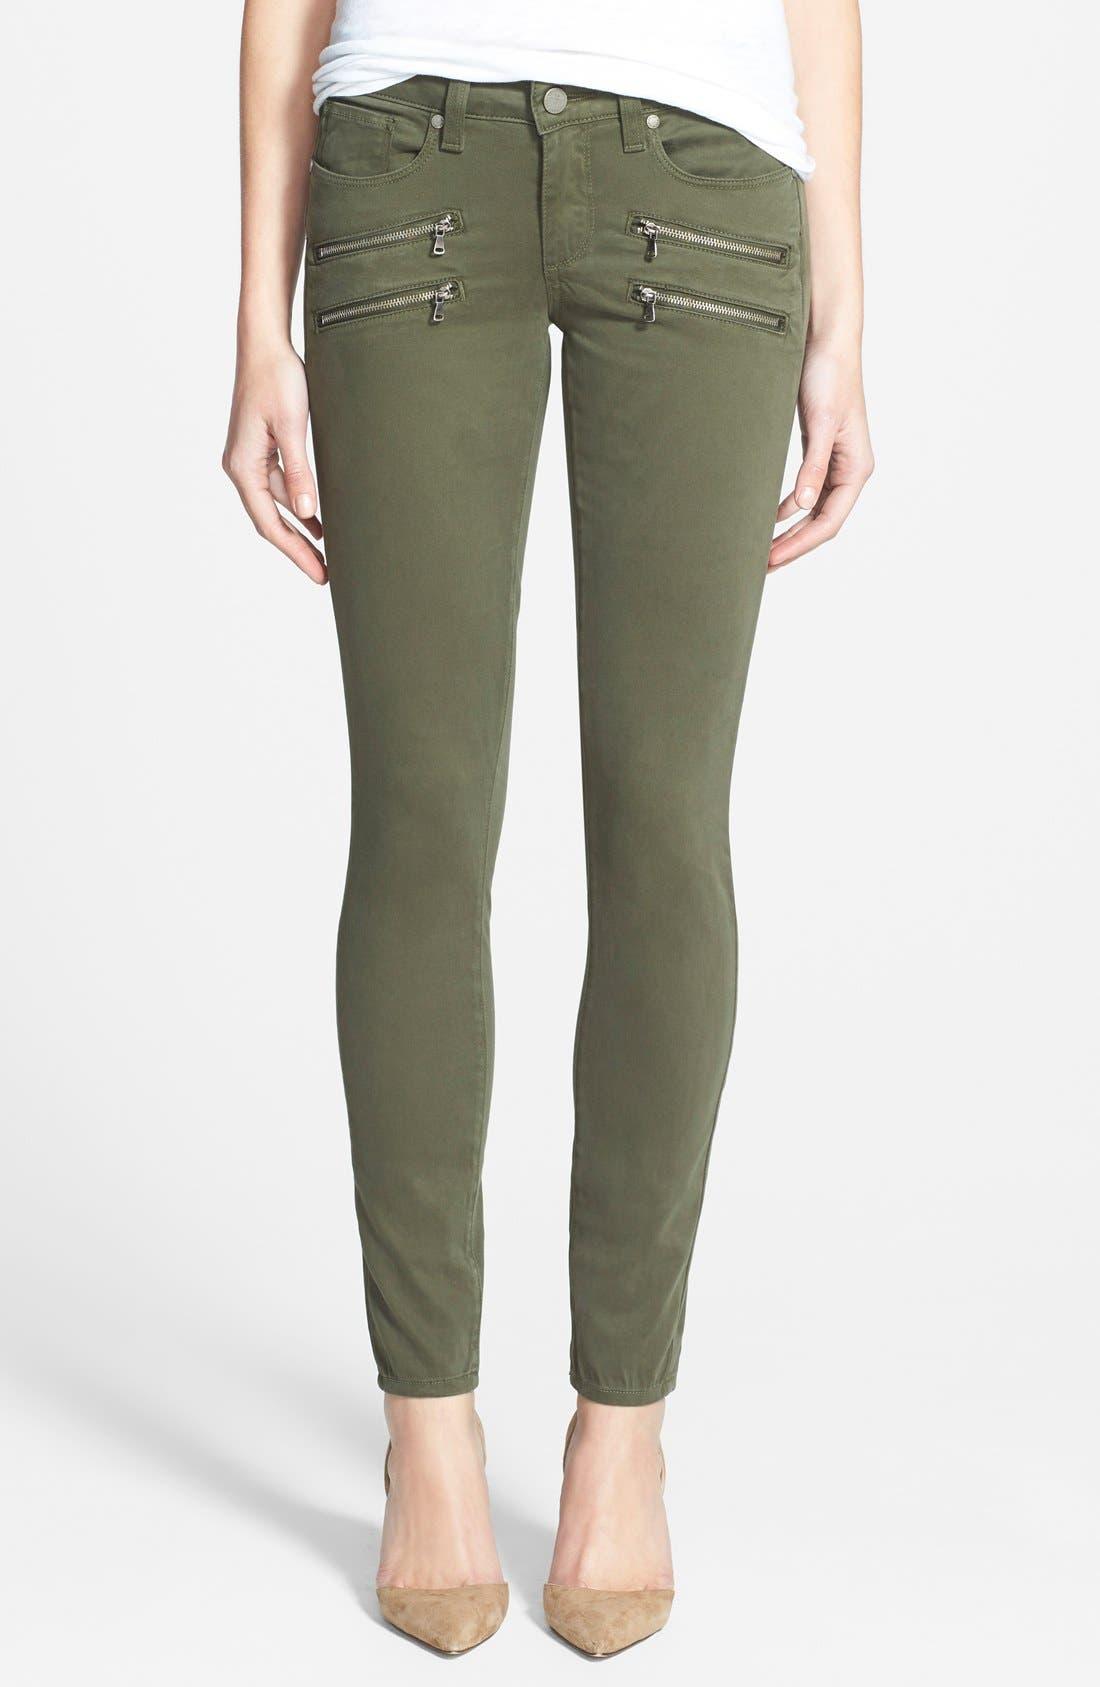 Alternate Image 1 Selected - Paige Denim 'Edgemont' Ultra Skinny Jeans (Pine Green)